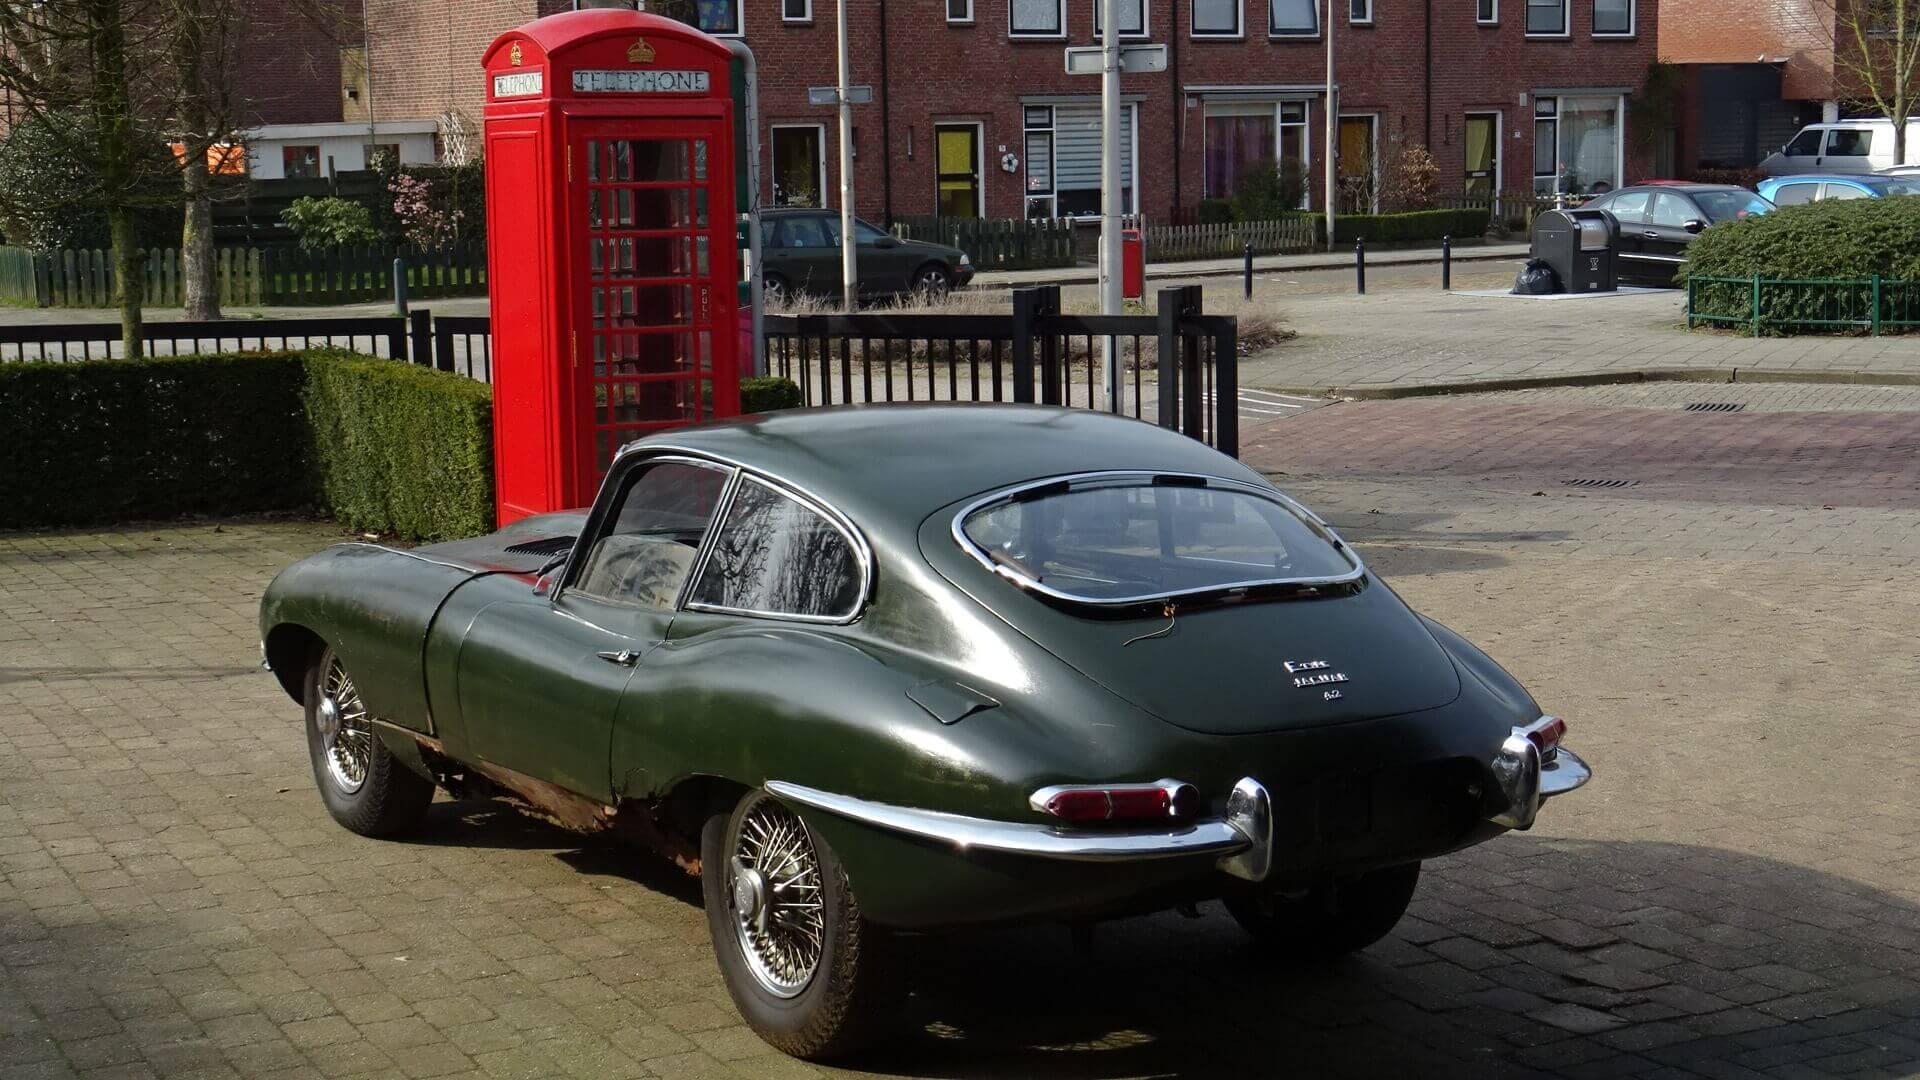 65 jaguar e type 4 2 fixed head coupe 1e 30801 union jack vintage cars. Black Bedroom Furniture Sets. Home Design Ideas